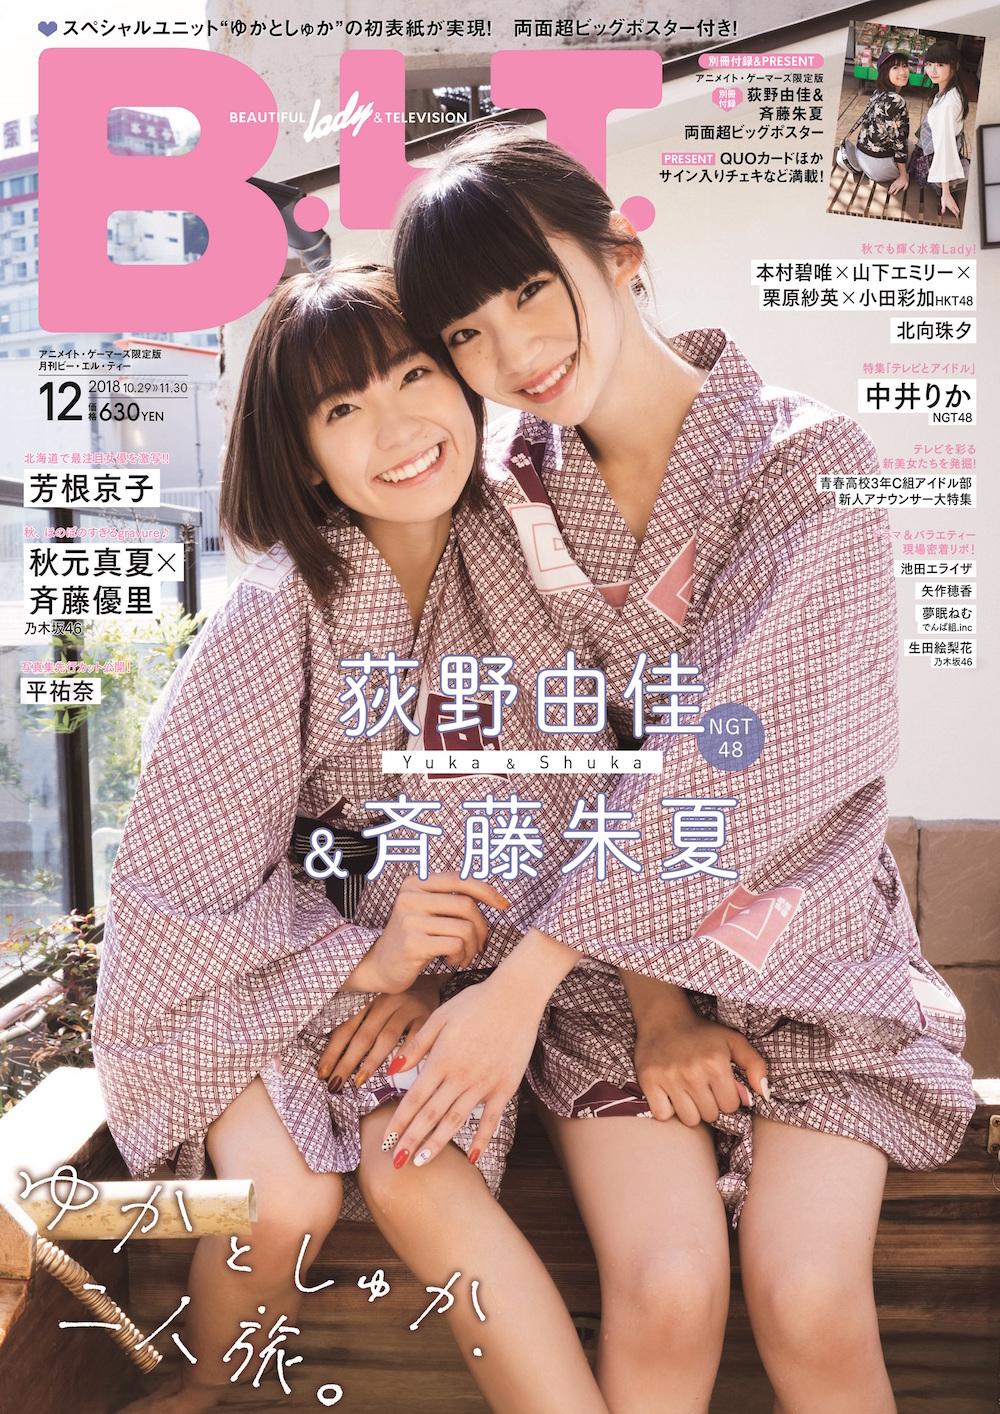 "NGT48・荻野由佳&斉藤朱夏、親友コンビ ""ゆかとしゅか""の温泉ふたり旅!"